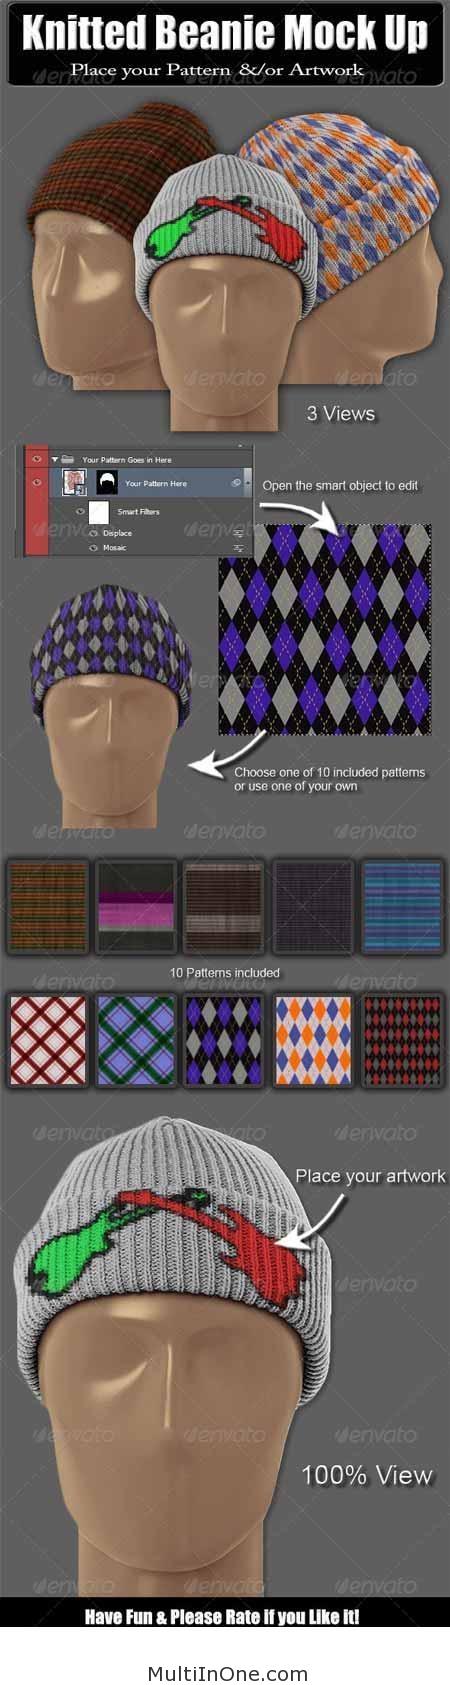 Knitted_Beanie_Mock_Up(MultiInOne.com)